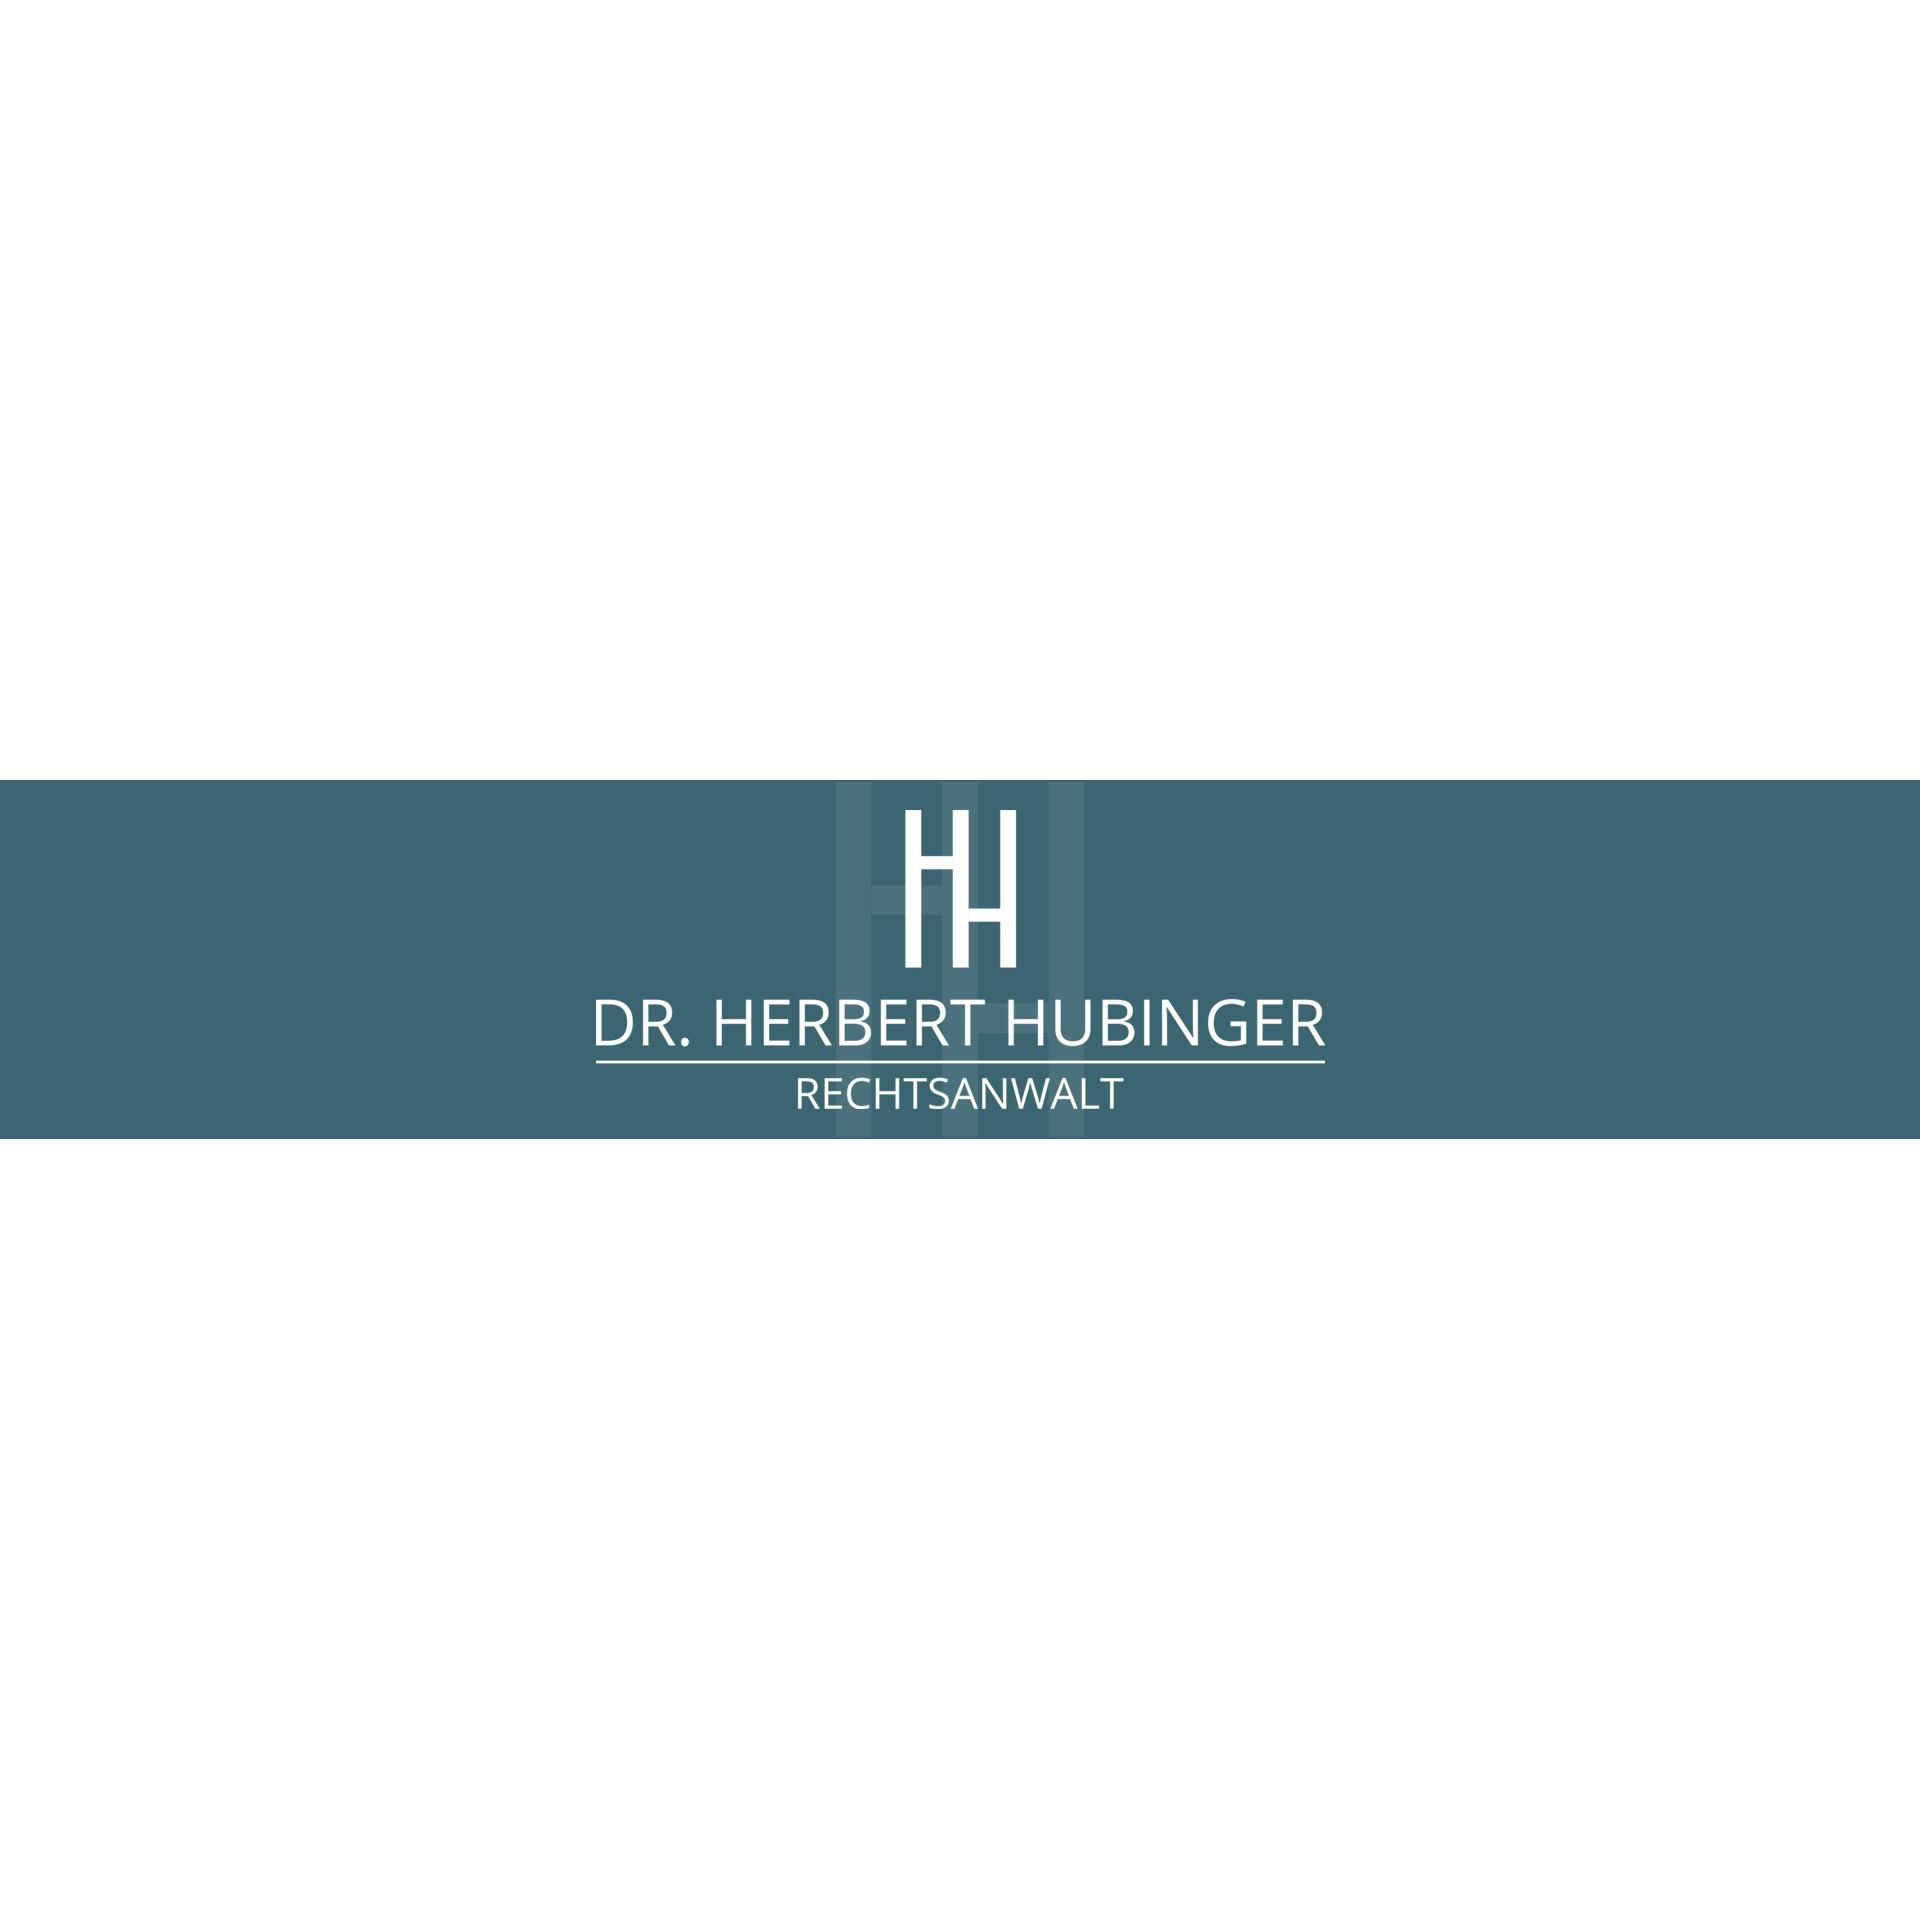 Rechtsanwaltskanzlei Dr. Herbert Hubinger Logo